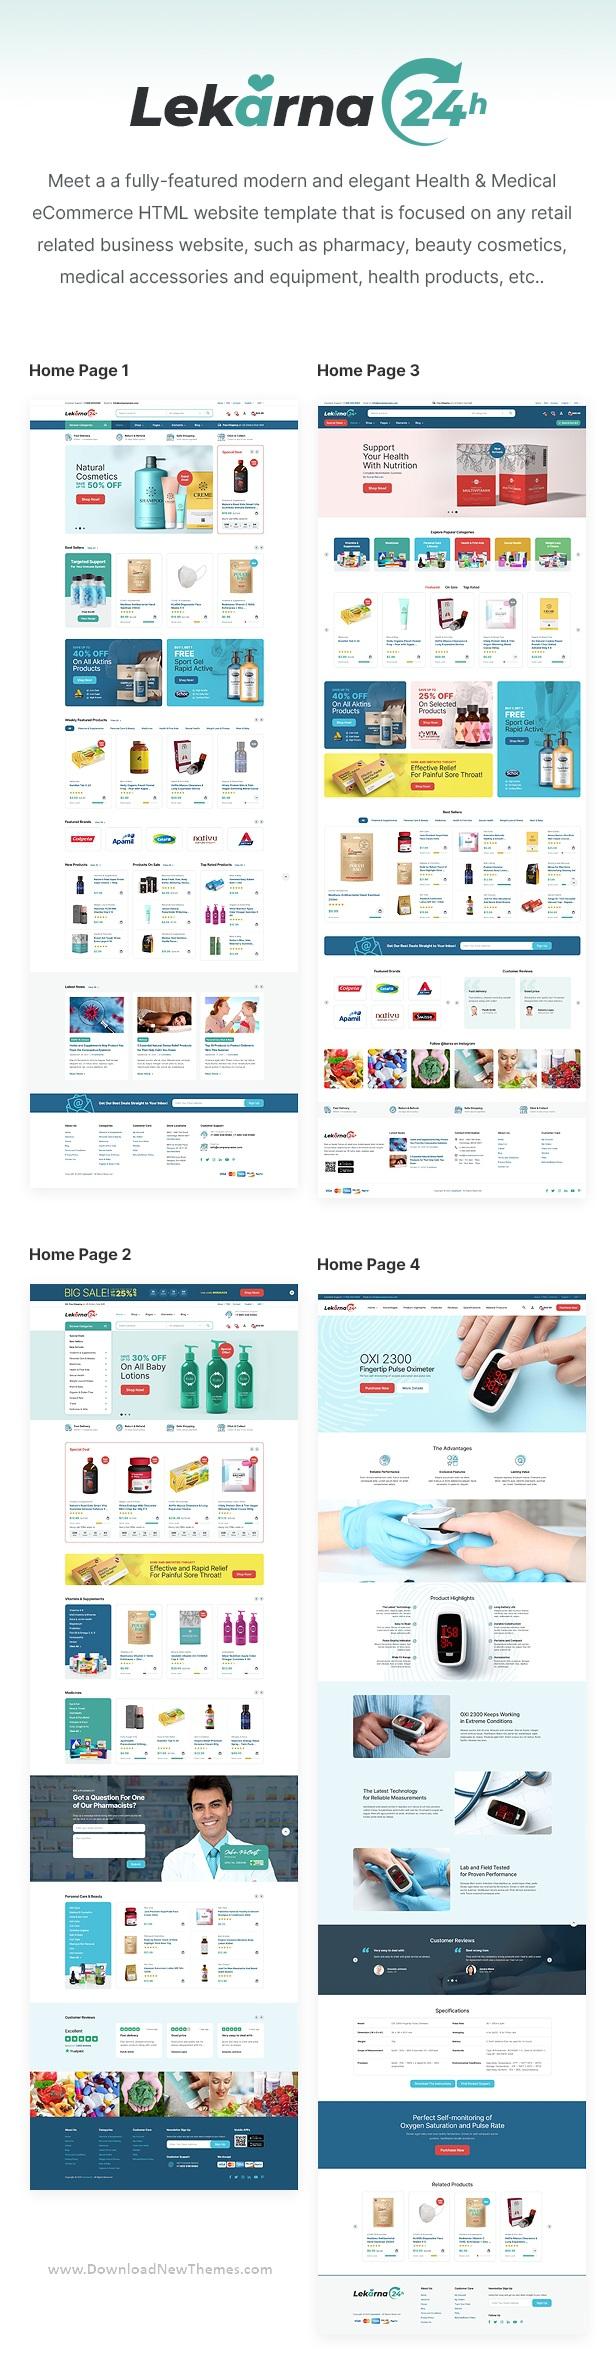 Health & Medical eCommerce Website Template